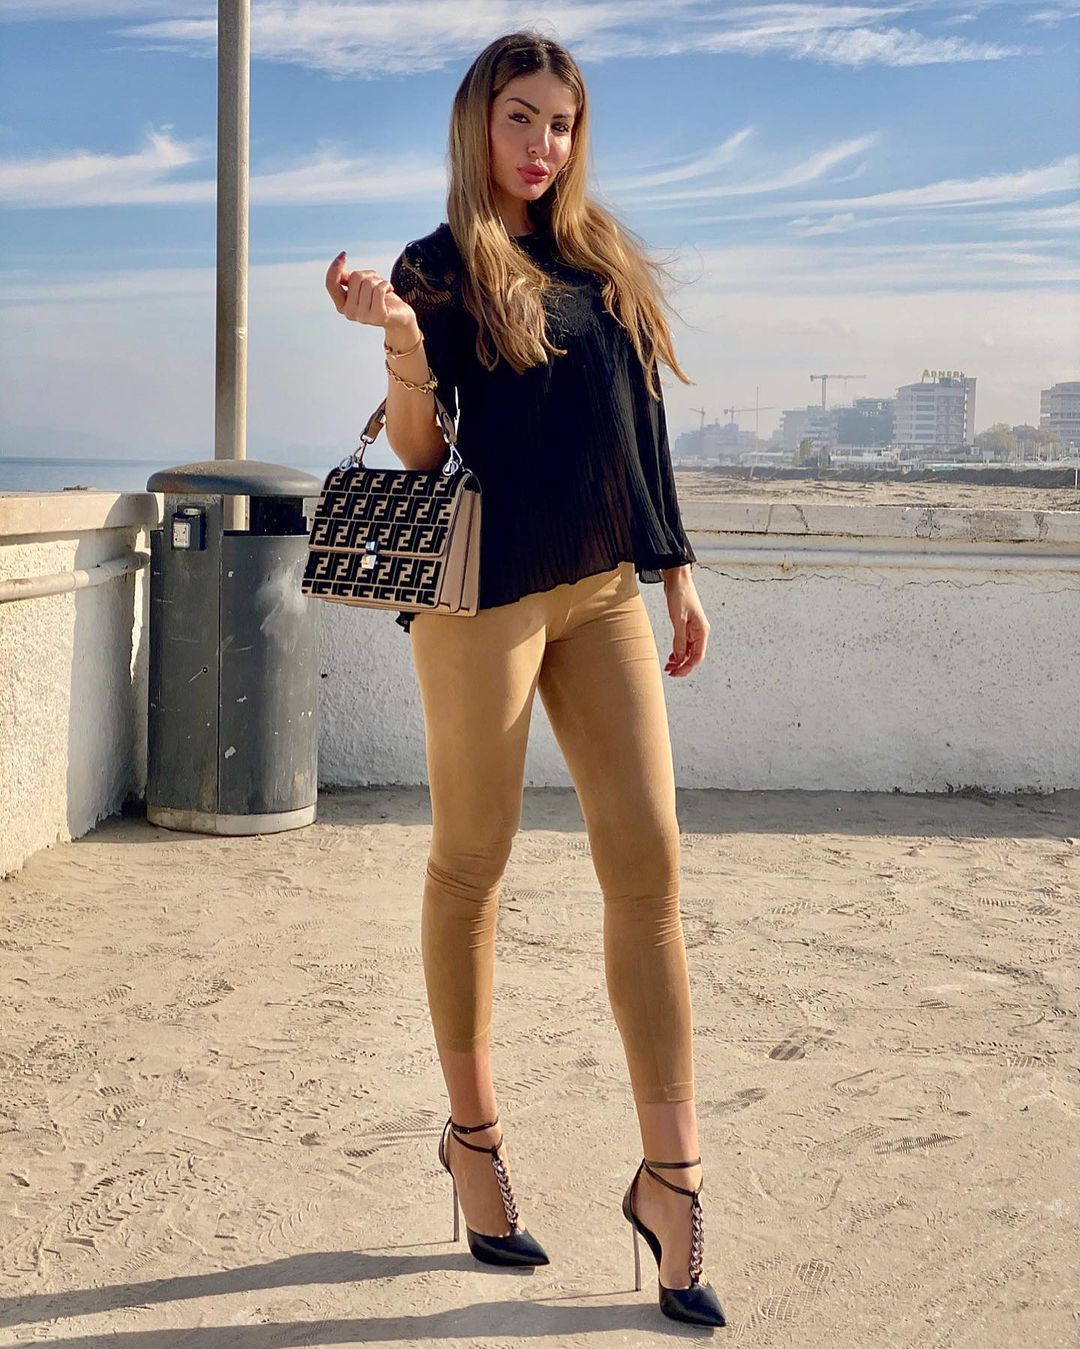 Jessica-Zanazzi-Wallpapers-Insta-Fit-Bio-7